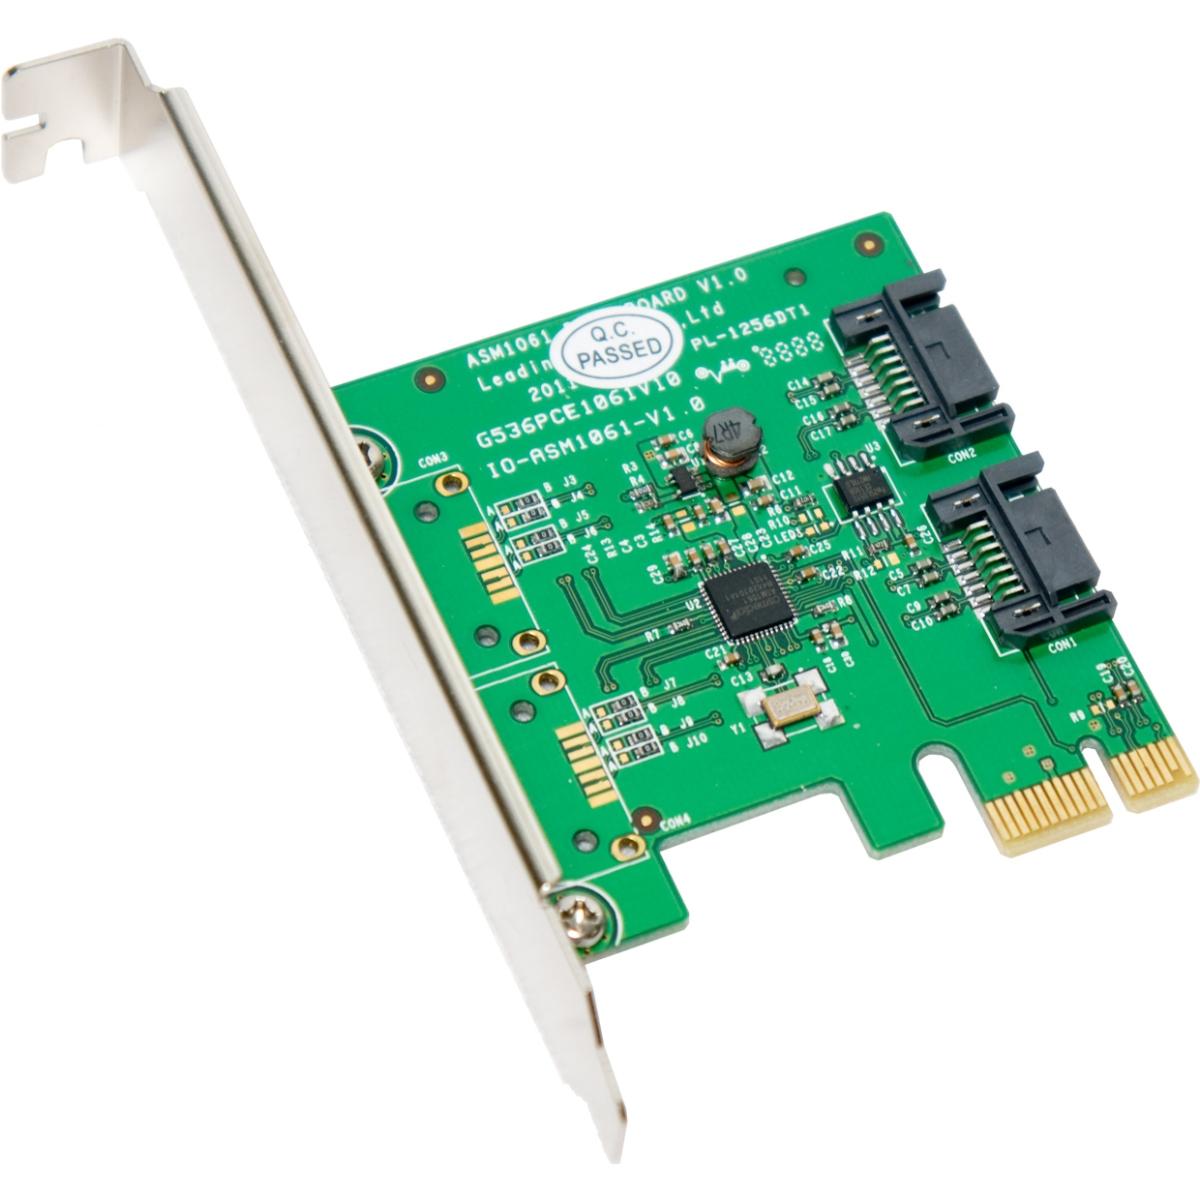 Multimedia SATA III 2 Internal 6Gbps Ports PCI-e Controller Card - 2 Serial ATA/600 Serial ATA Internal - PCI Express 2.0 x1